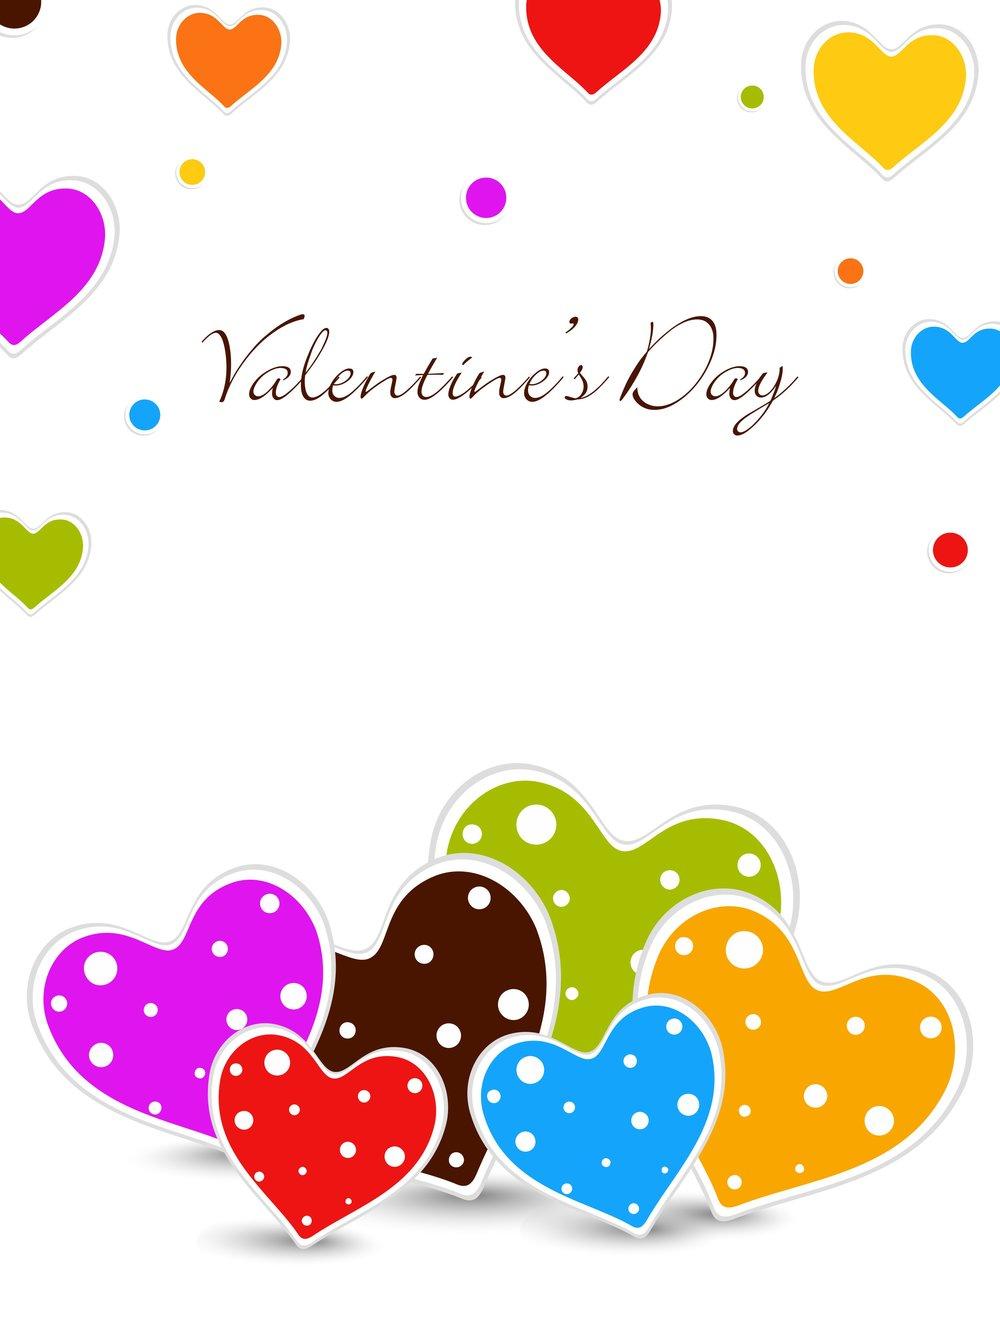 happy-valentines-day-background_zy4IKj_O.jpg